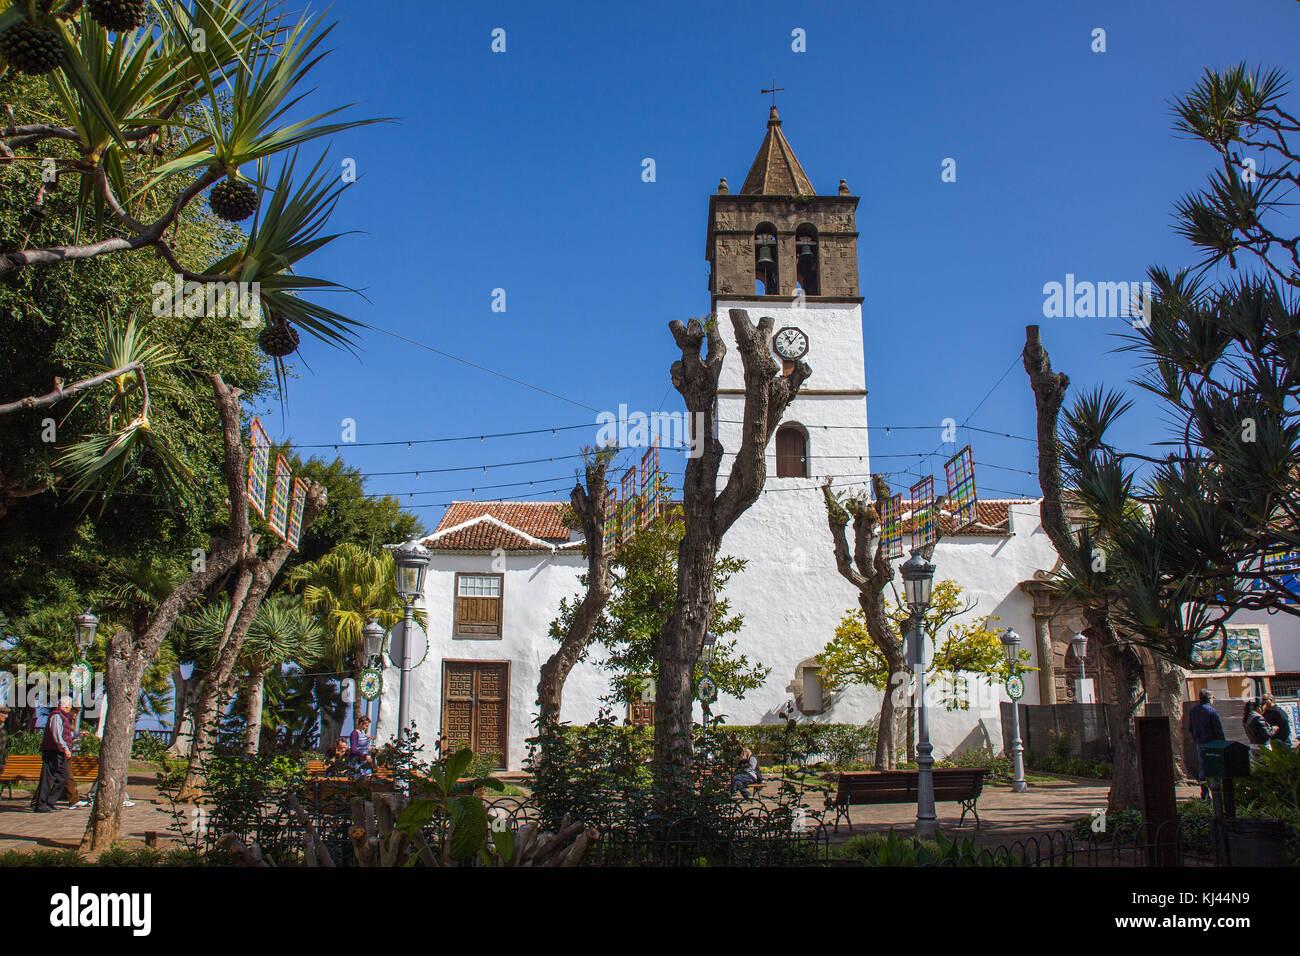 Iglesia de San Marcos, Kirche in Icod de los Vinos, Teneriffa, Kanarische Inseln, Spanien, Atlantischer Ozean, Europa - Stock Image